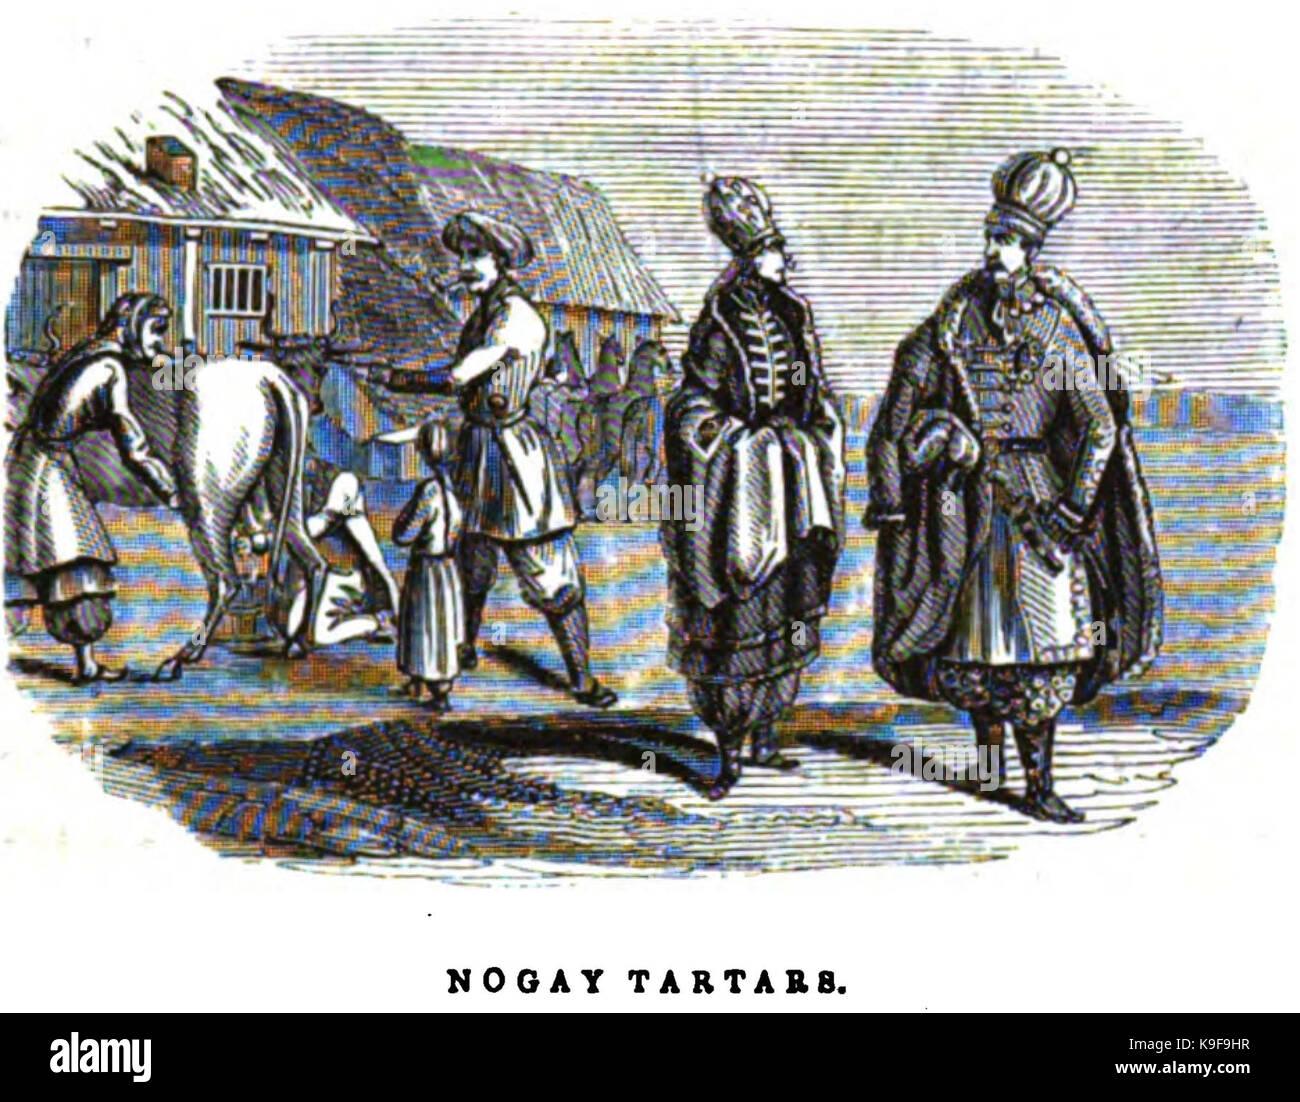 nogay-tartars-edmund-spencer-travels-in-